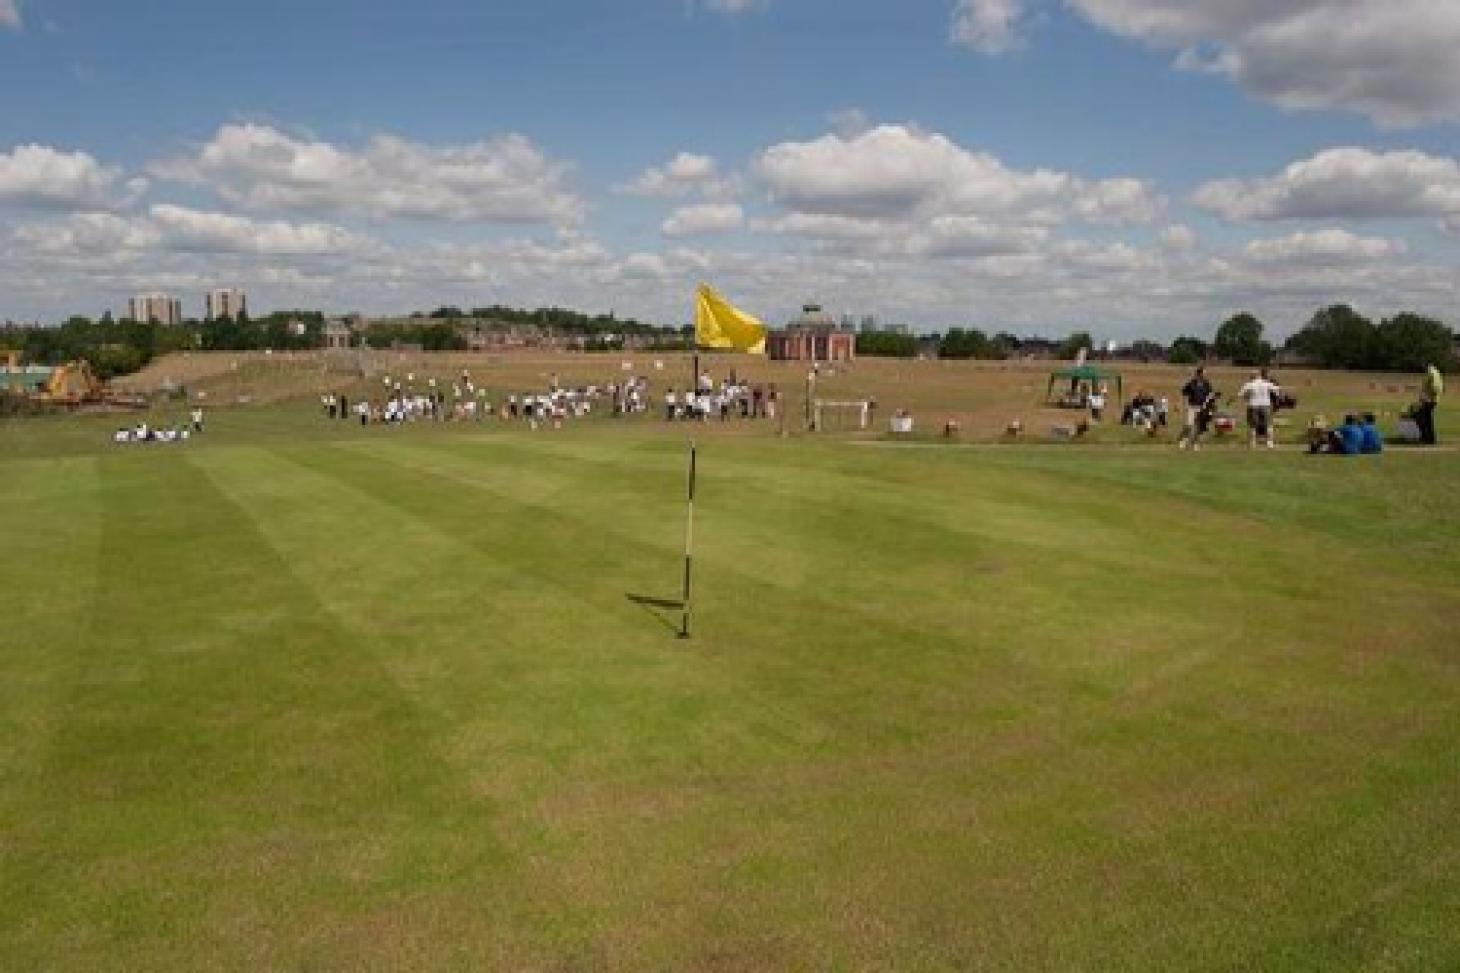 Aquarius Golf Club 9 hole golf course